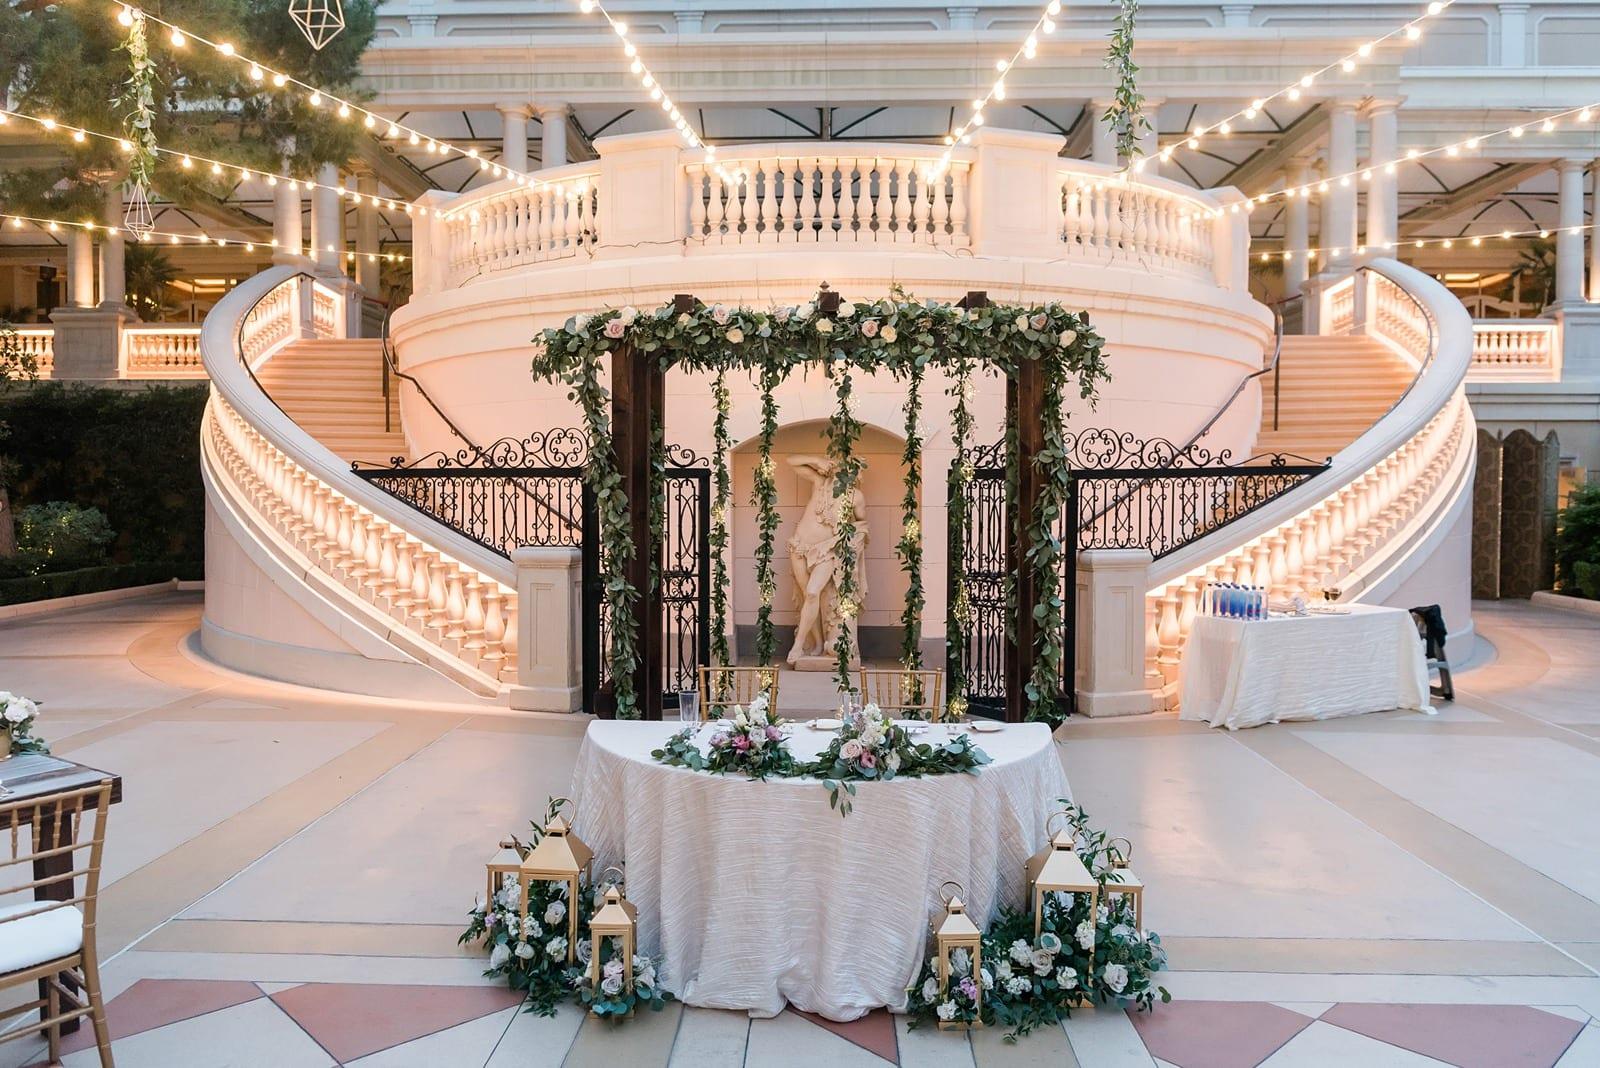 Luxe Las Vegas Destination Wedding At The Bellagio Destination